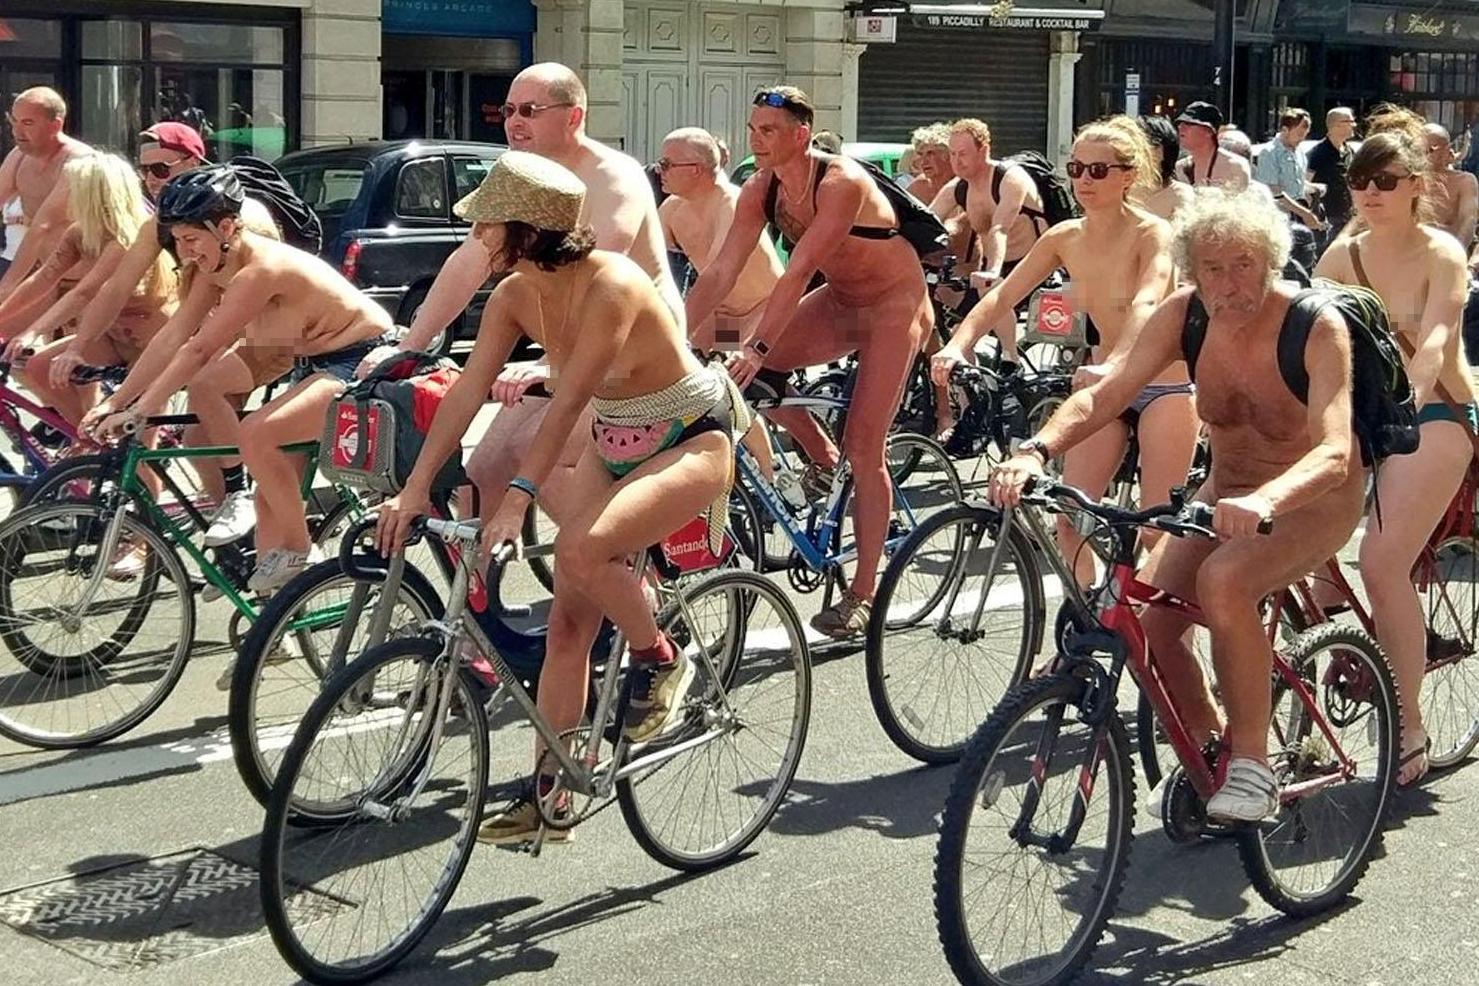 Combat reccomend Pictures of nudist bike protest